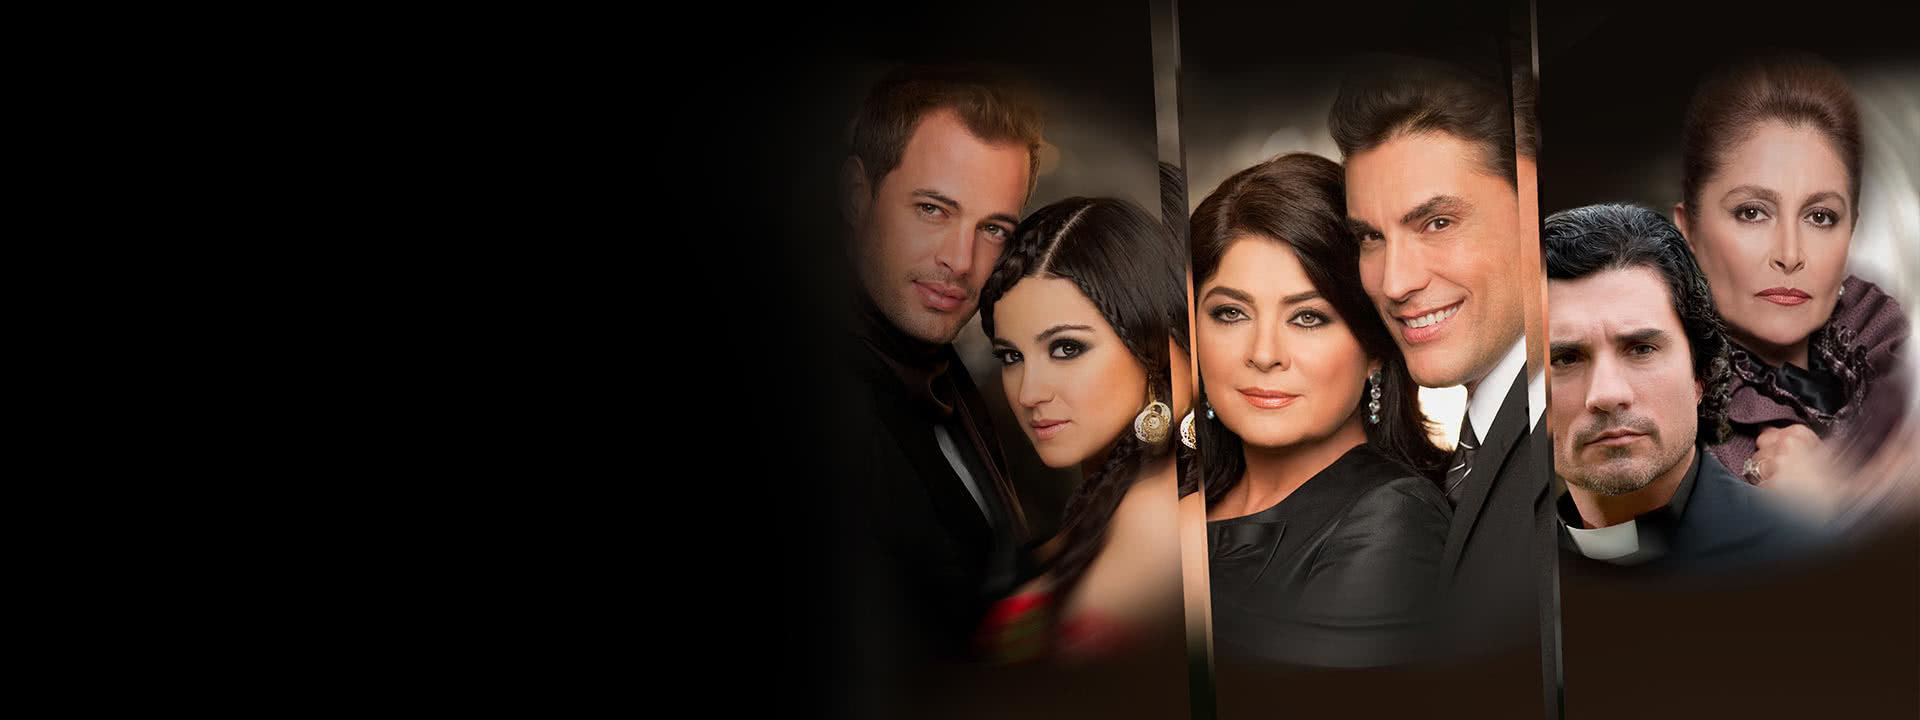 Triunfo del amor telenovela